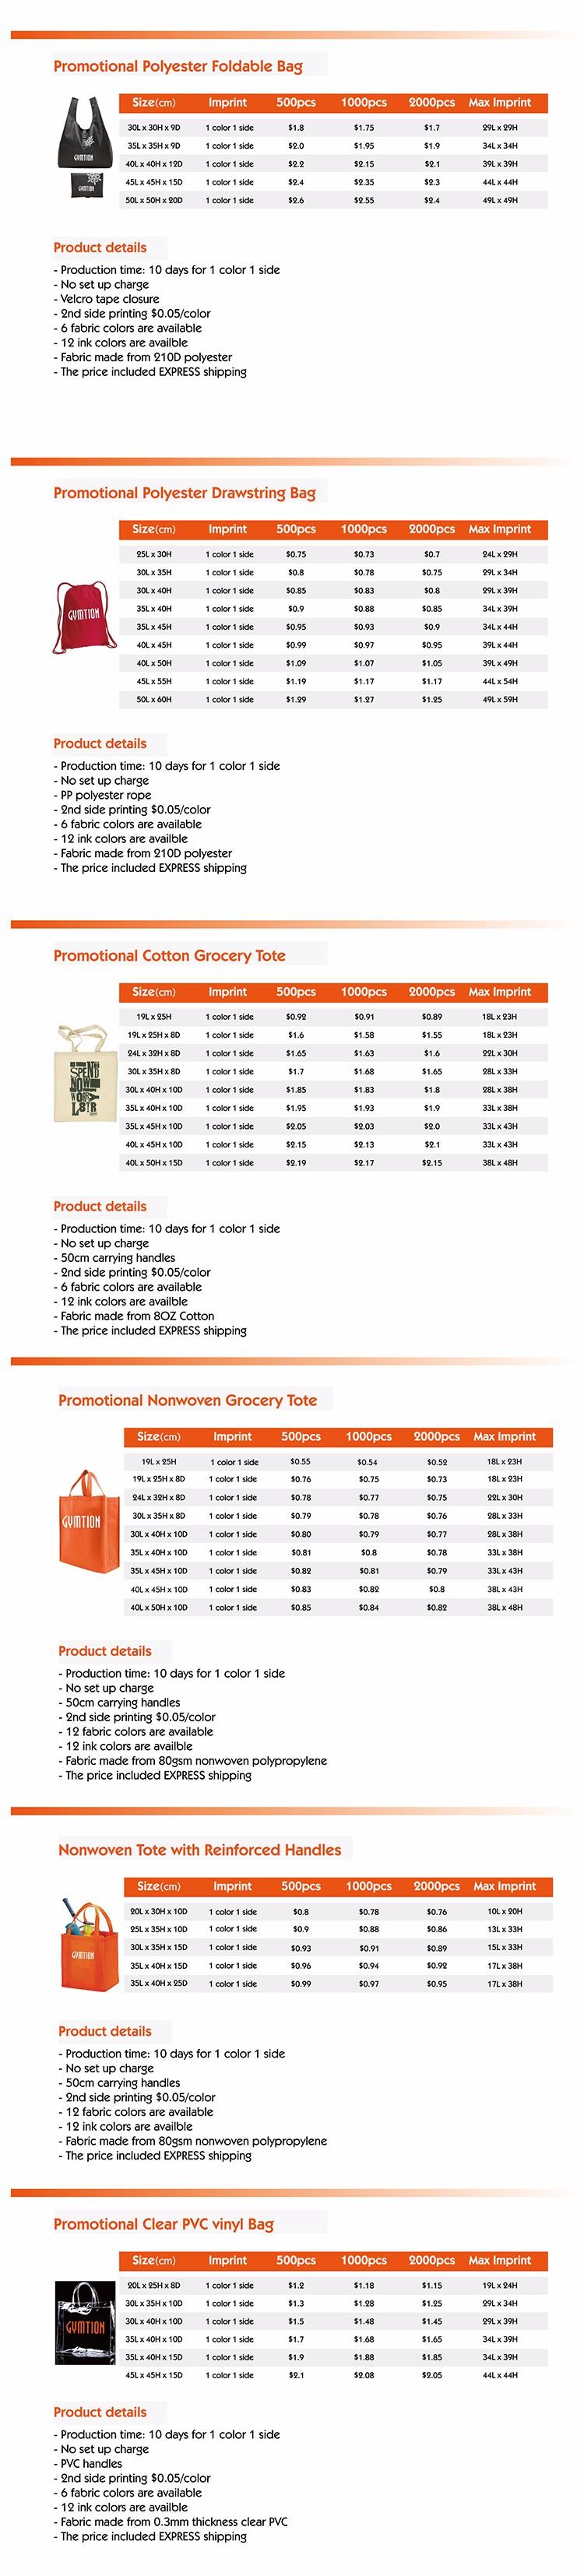 Foldable bag product details-1